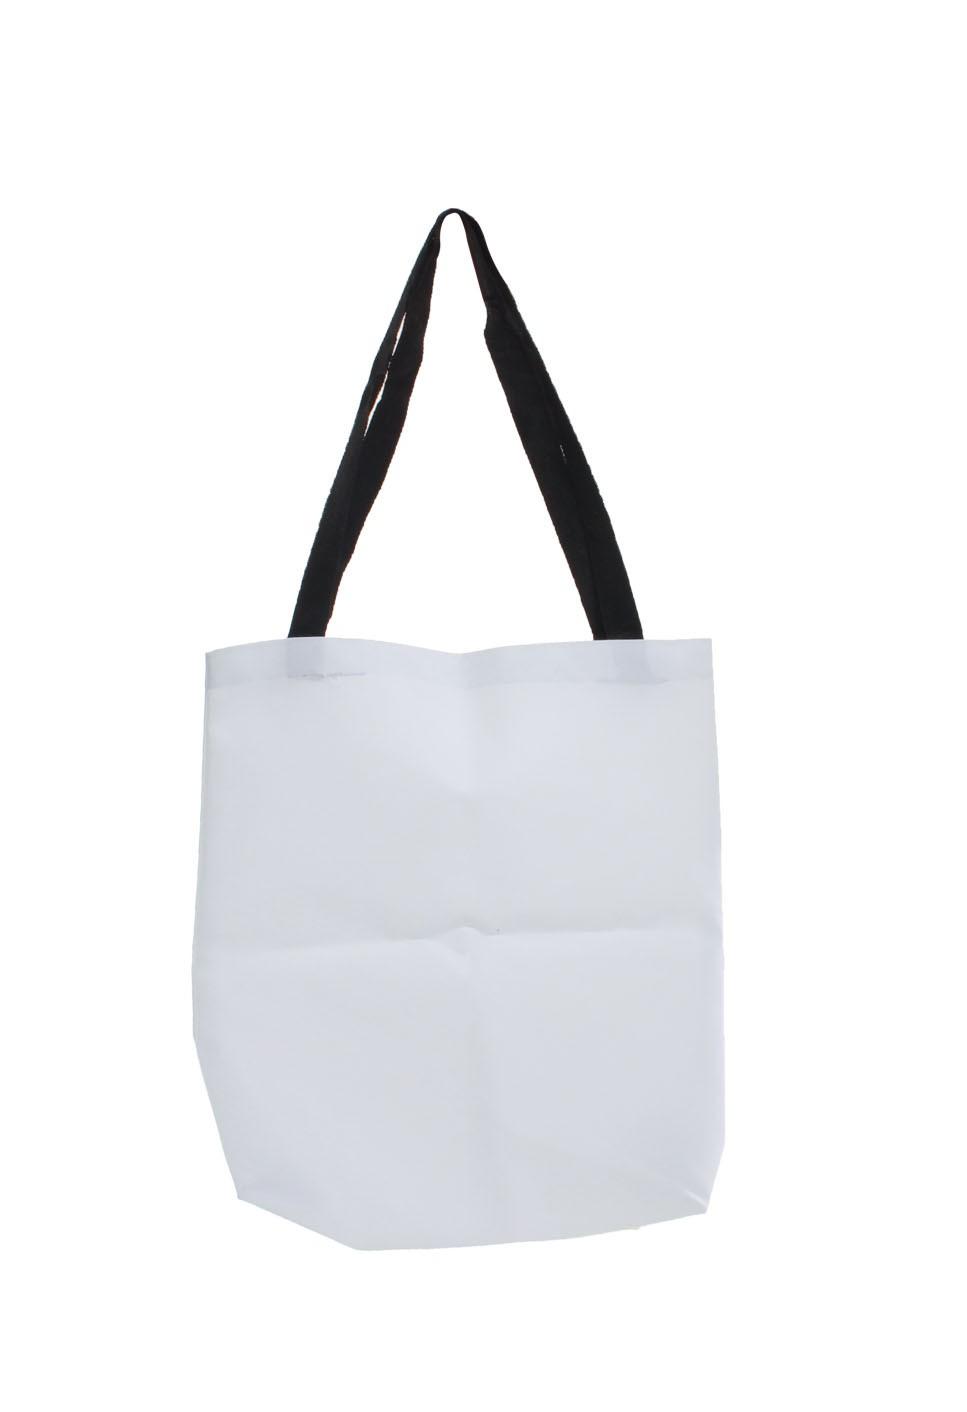 Bolsa Cordoba com Ziper Branca - Pra Sublimar 6e6fb042078d4